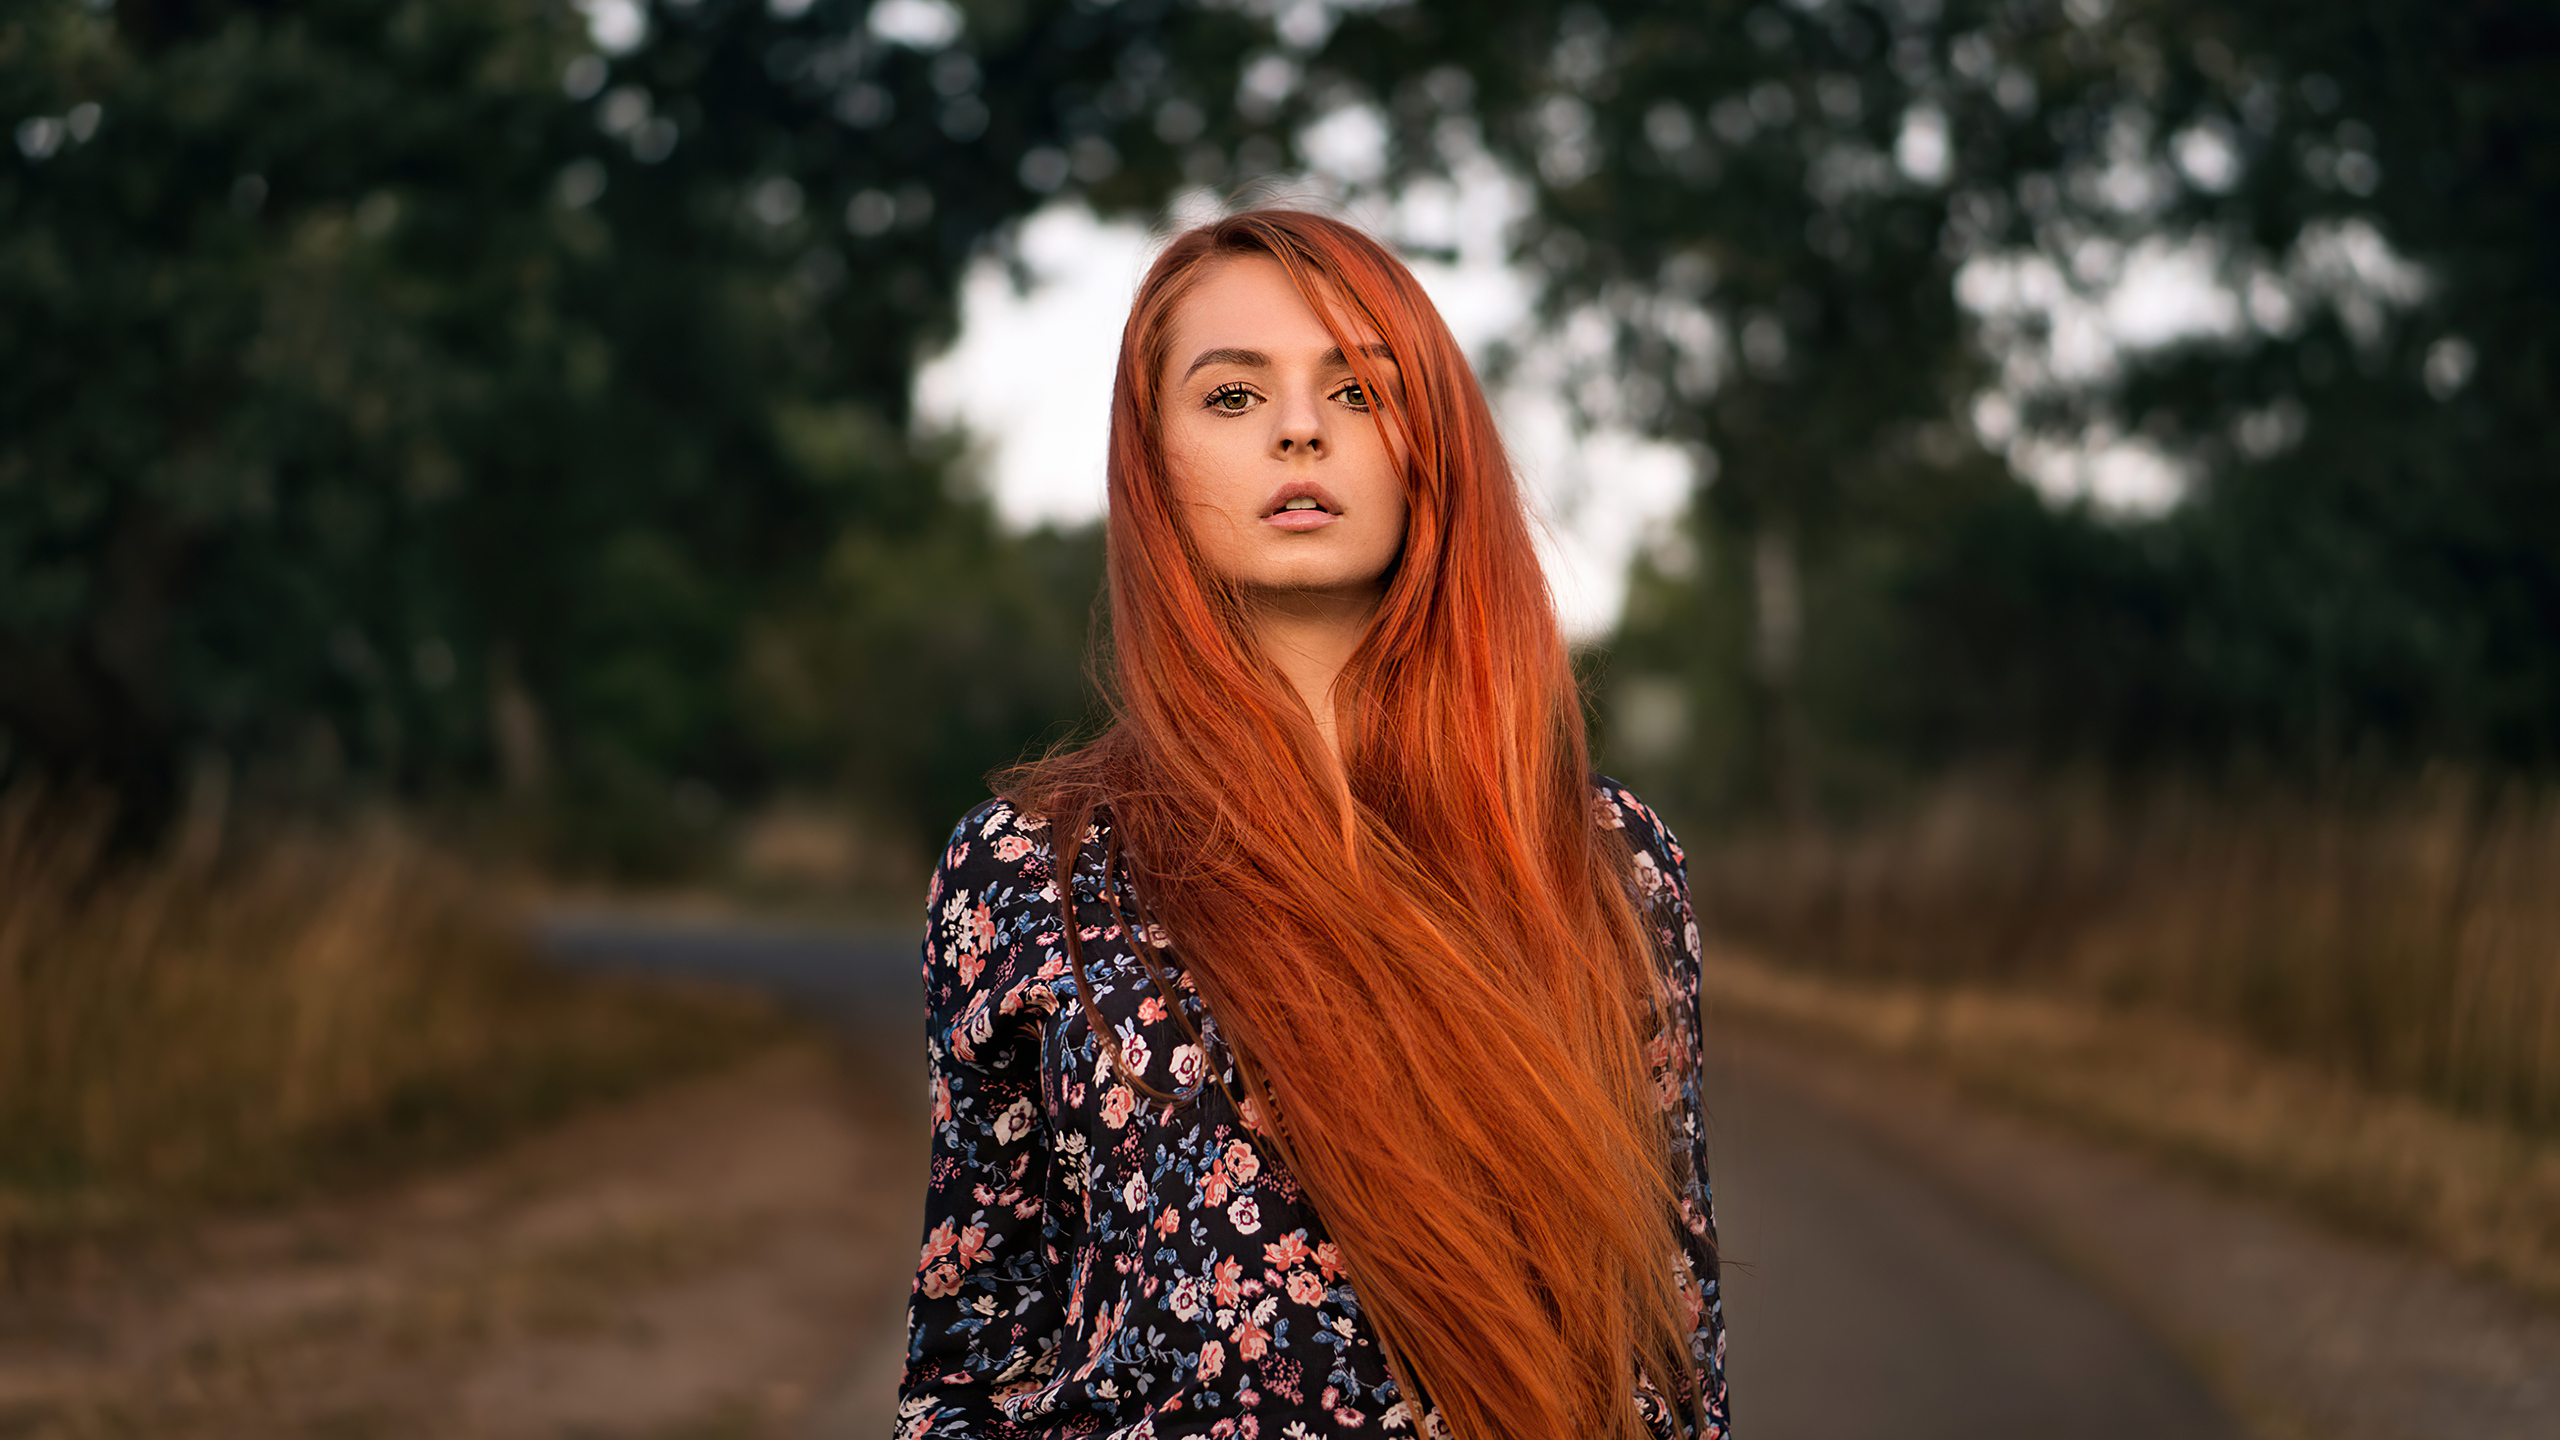 red-head-girl-outdoor-road-4k-rl.jpg